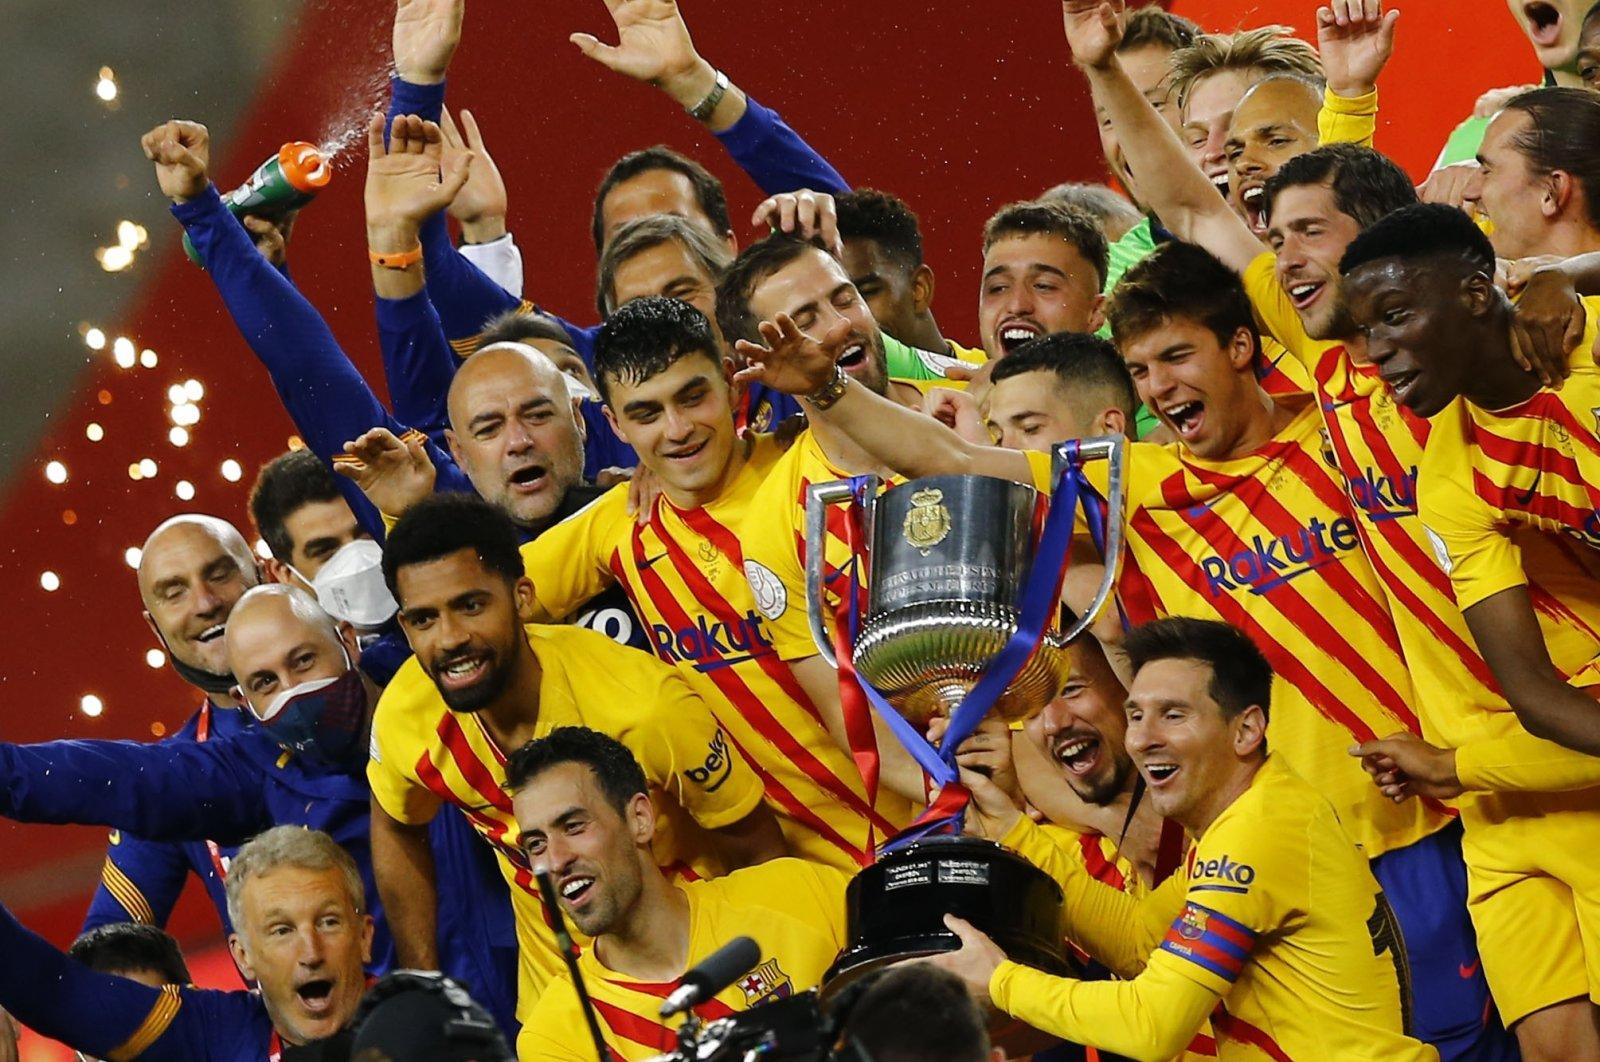 Barcelona's Lionel Messi and teammates celebrate winning the Copa del Rey with the trophy Estadio La Cartuja de Sevilla, Seville, Spain, April 17, 2021. (Reuters Photo)